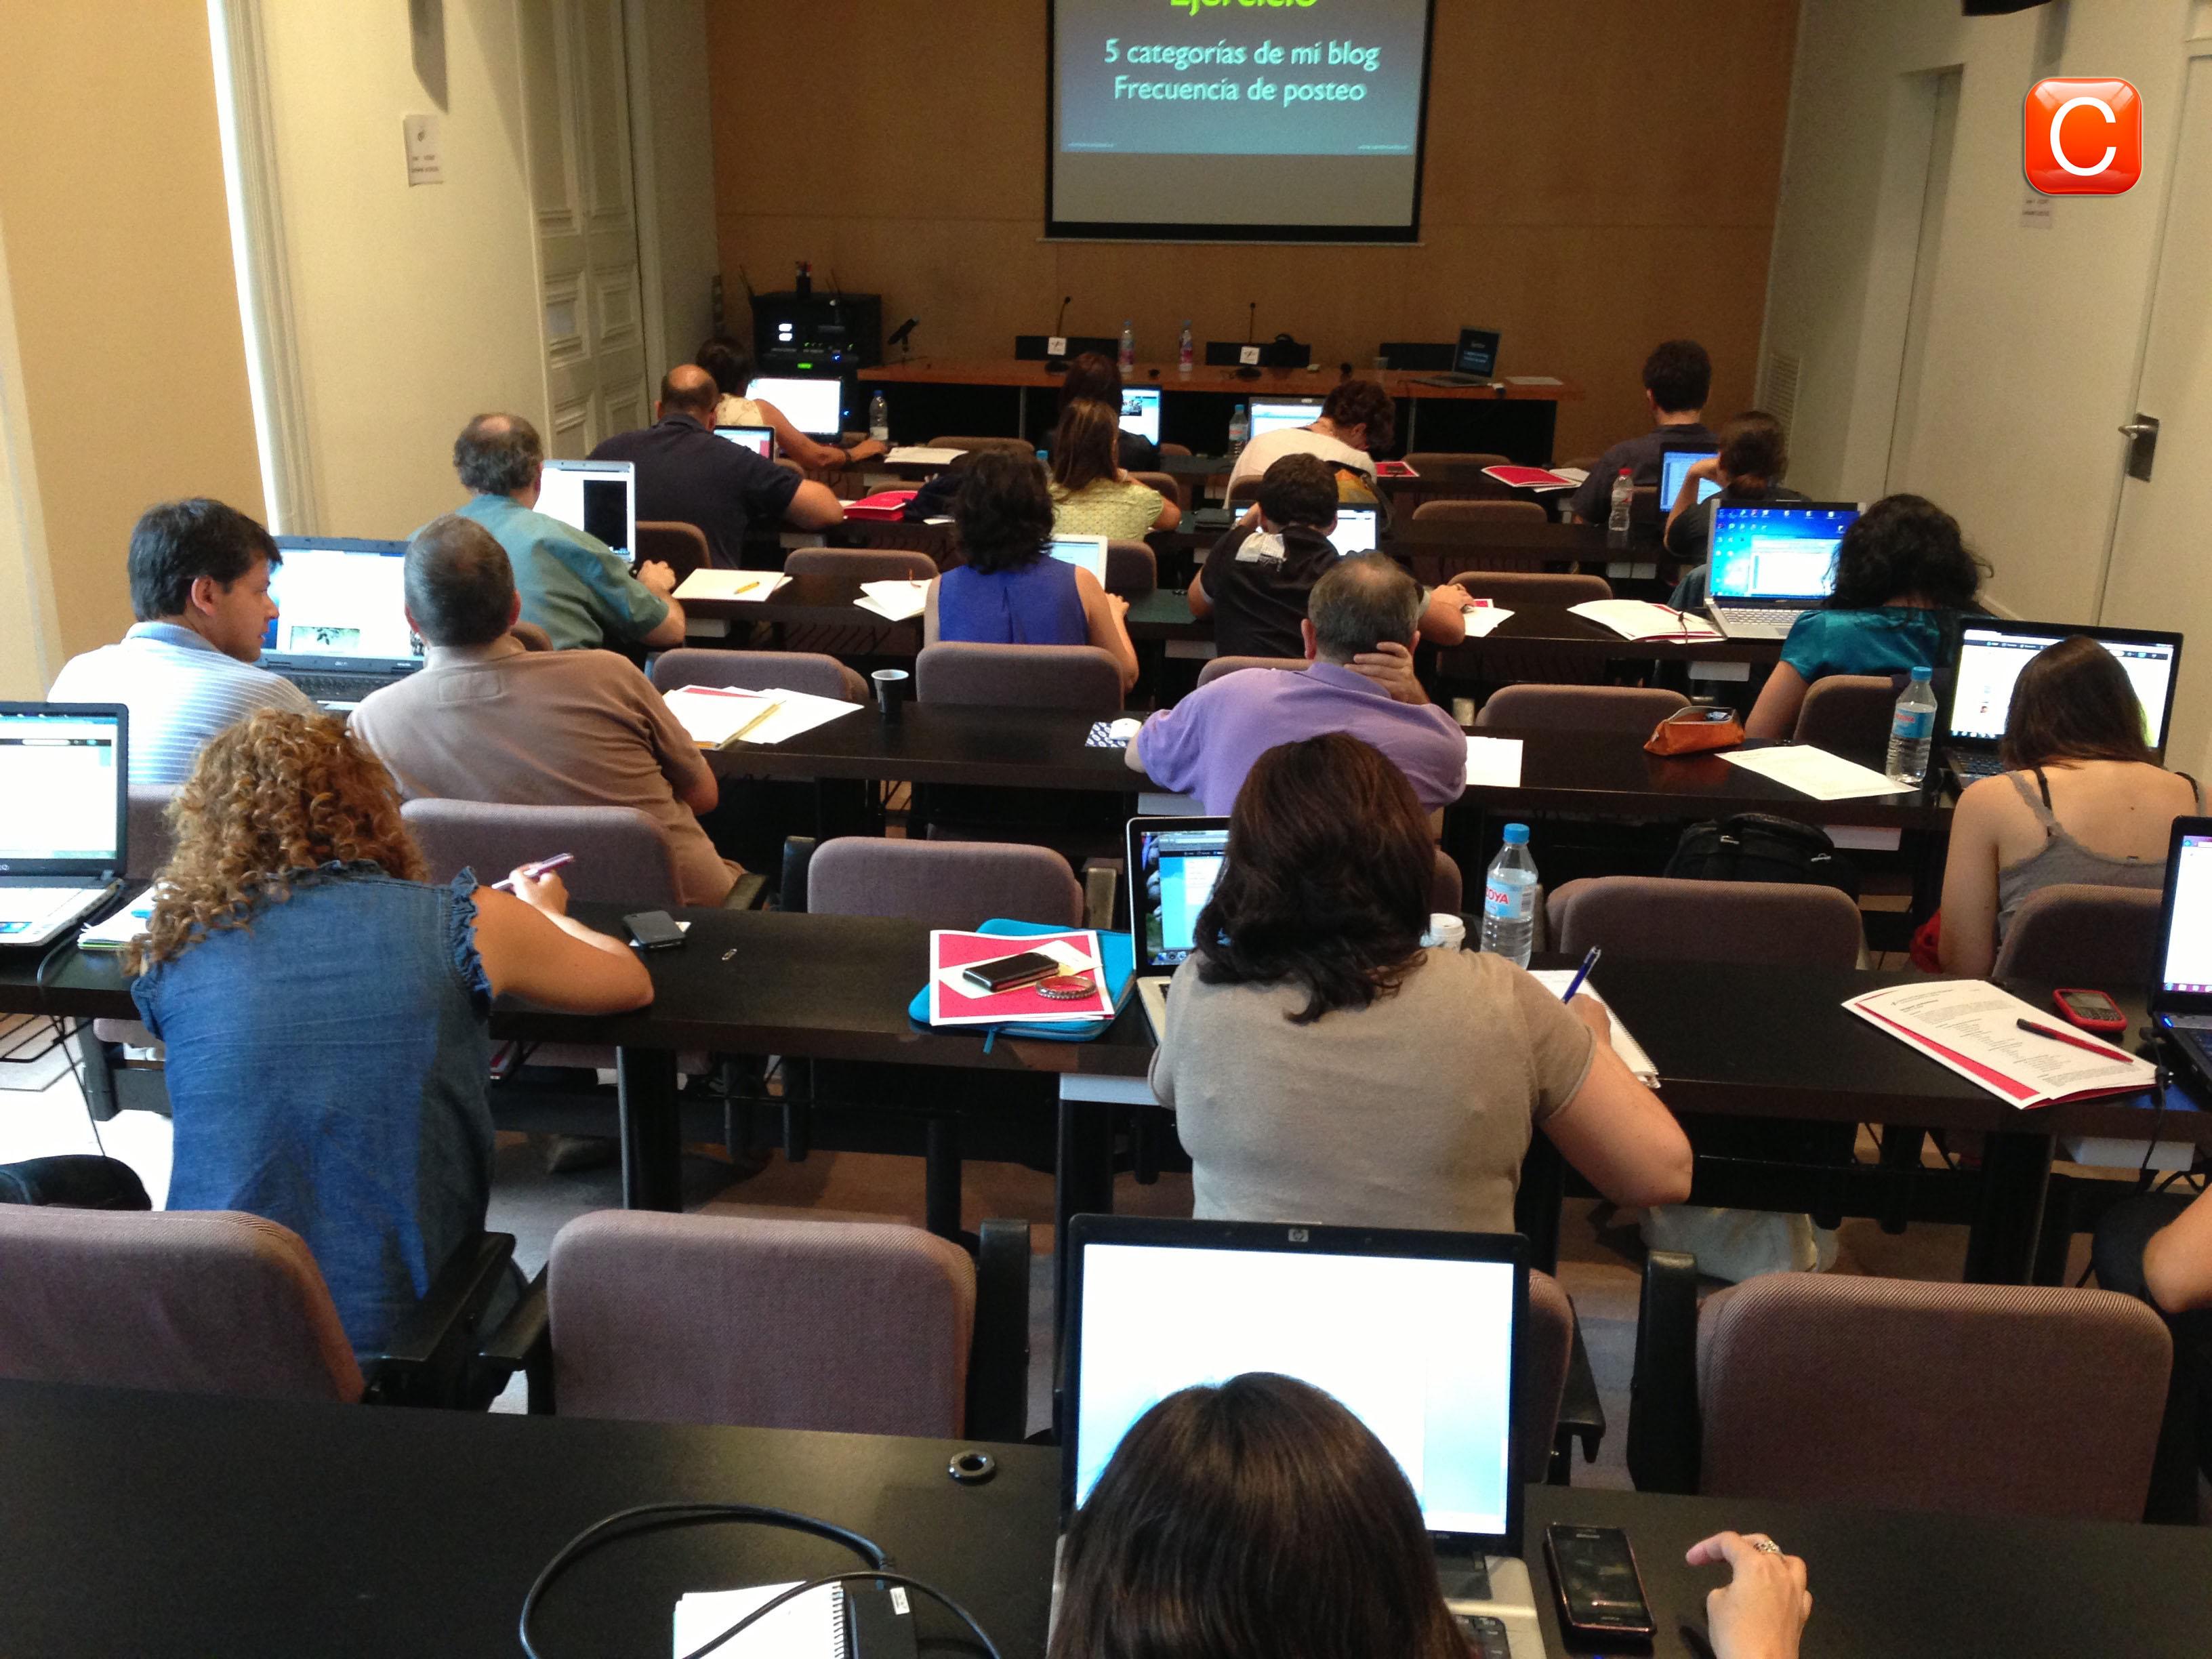 cursos redes sociales community internet the social media company